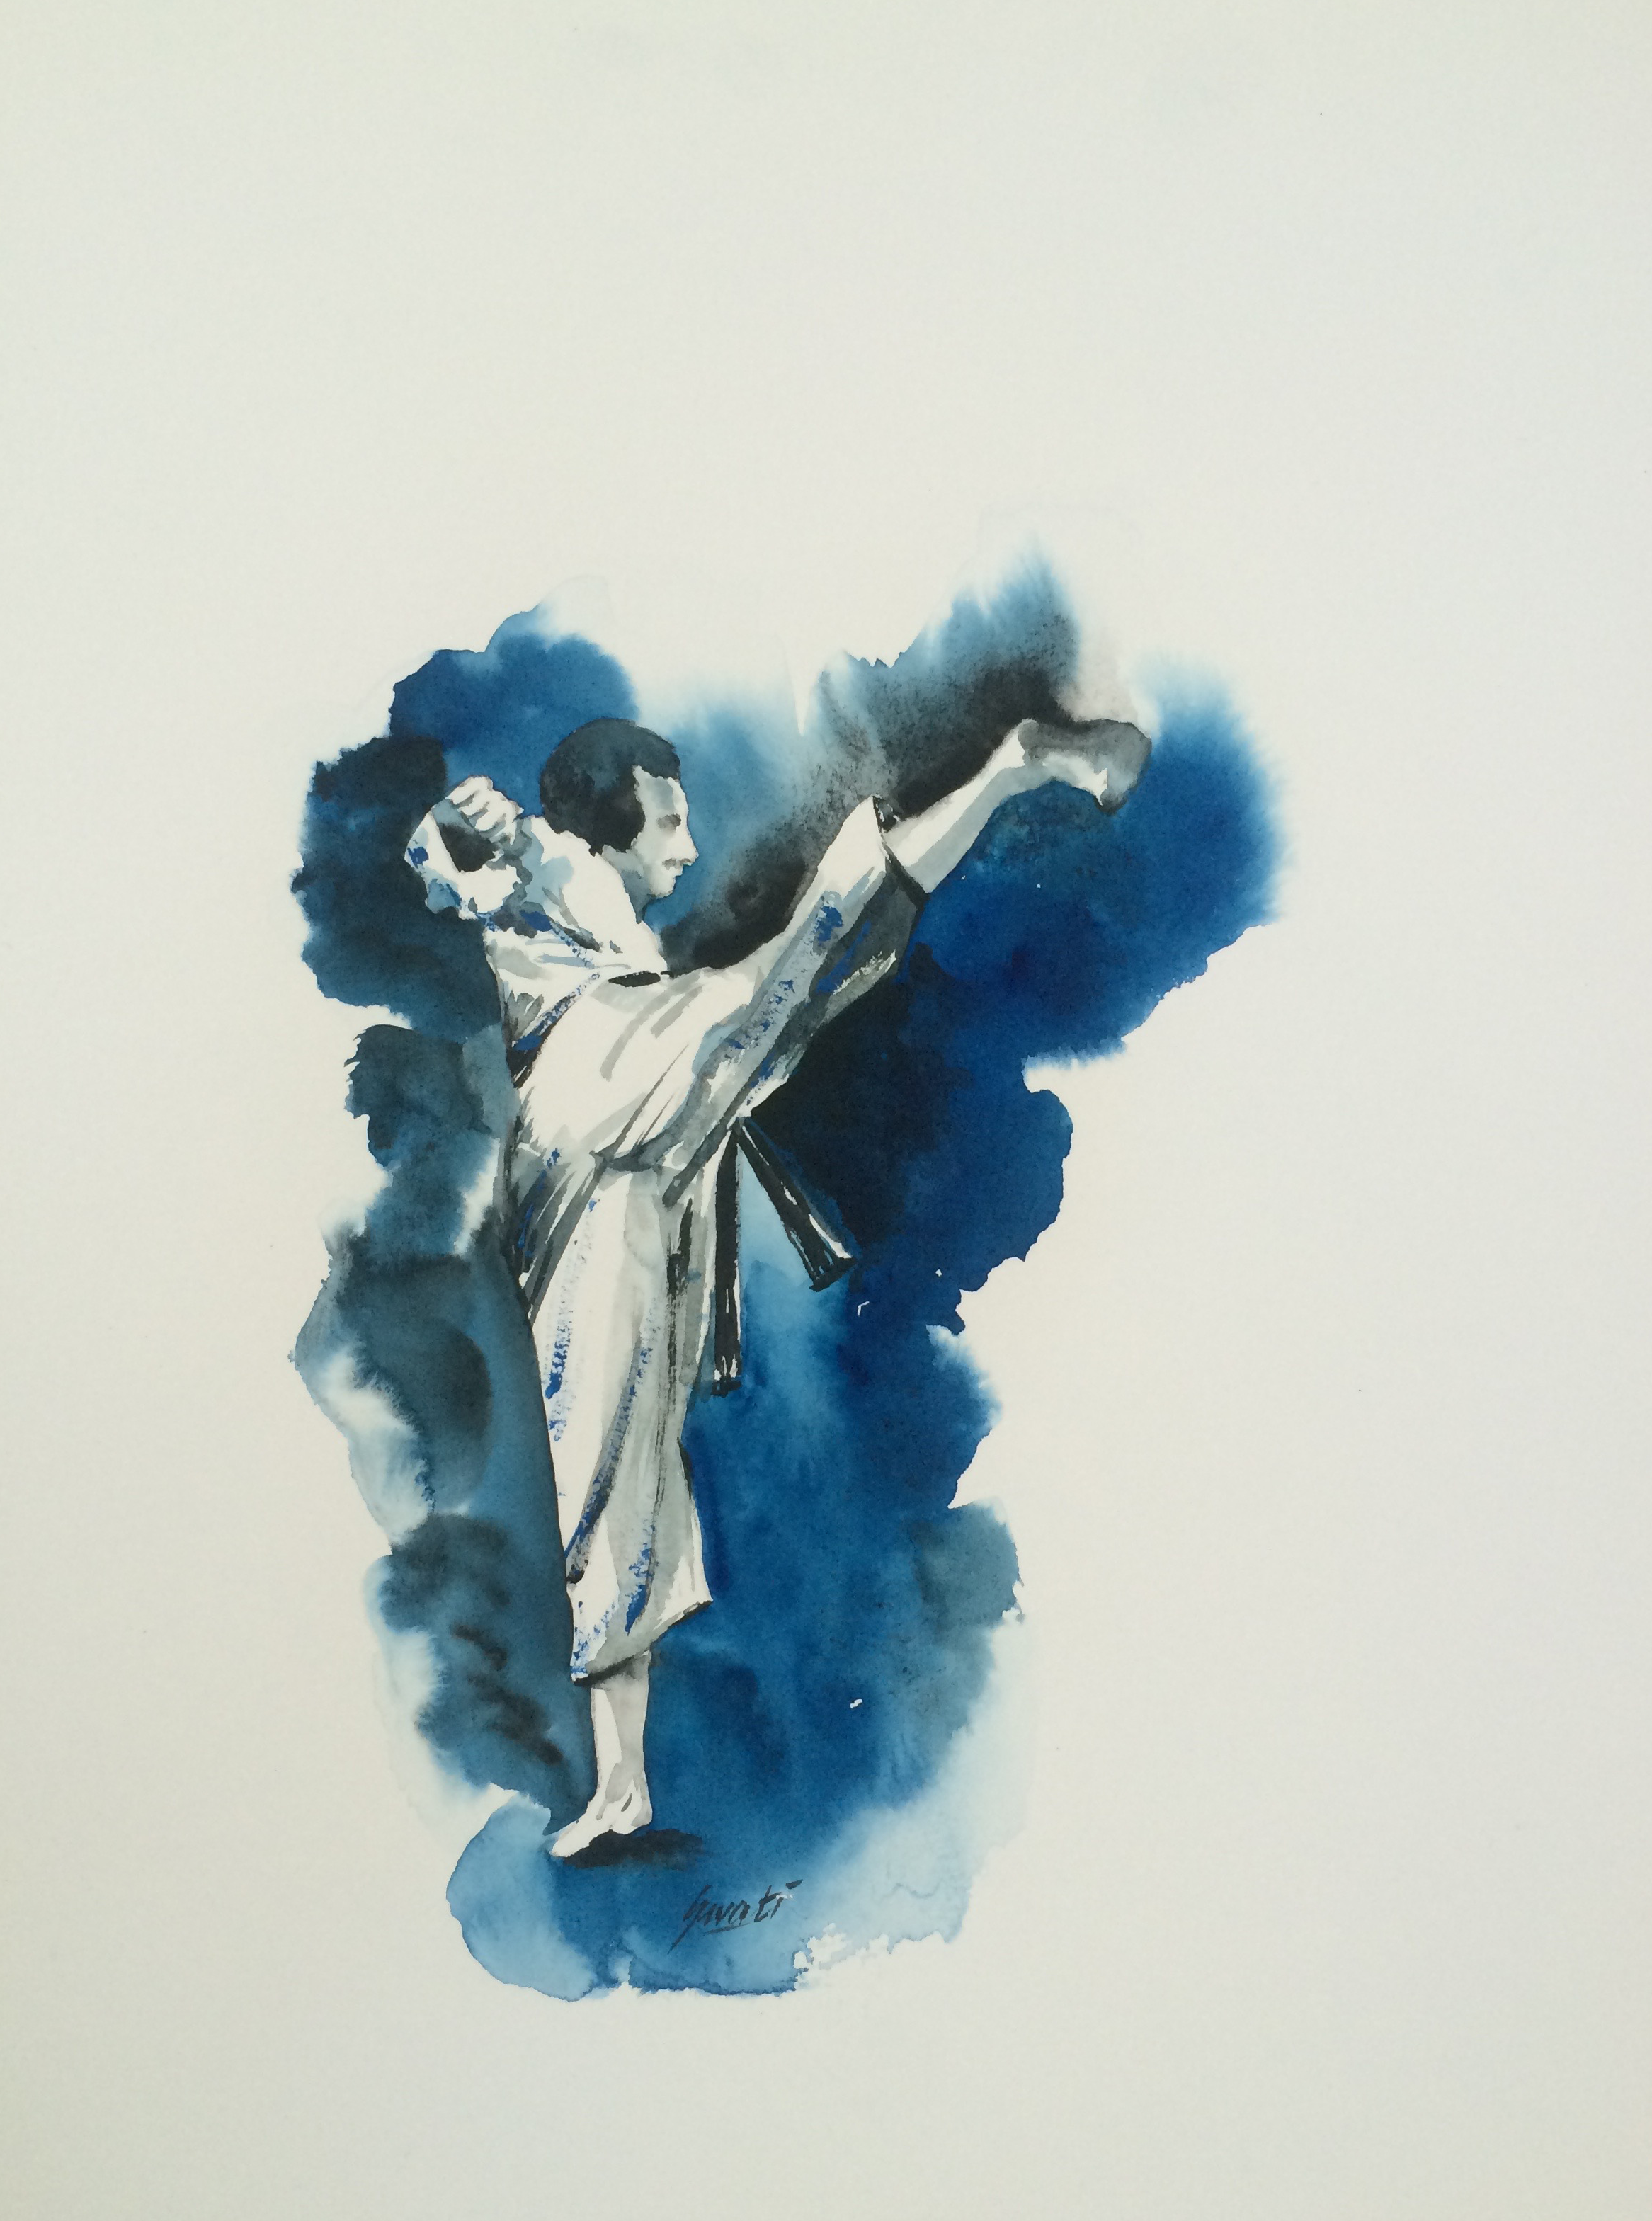 Mavashi Giri Shotokan Karate World Of Color Shotokan Karate Art